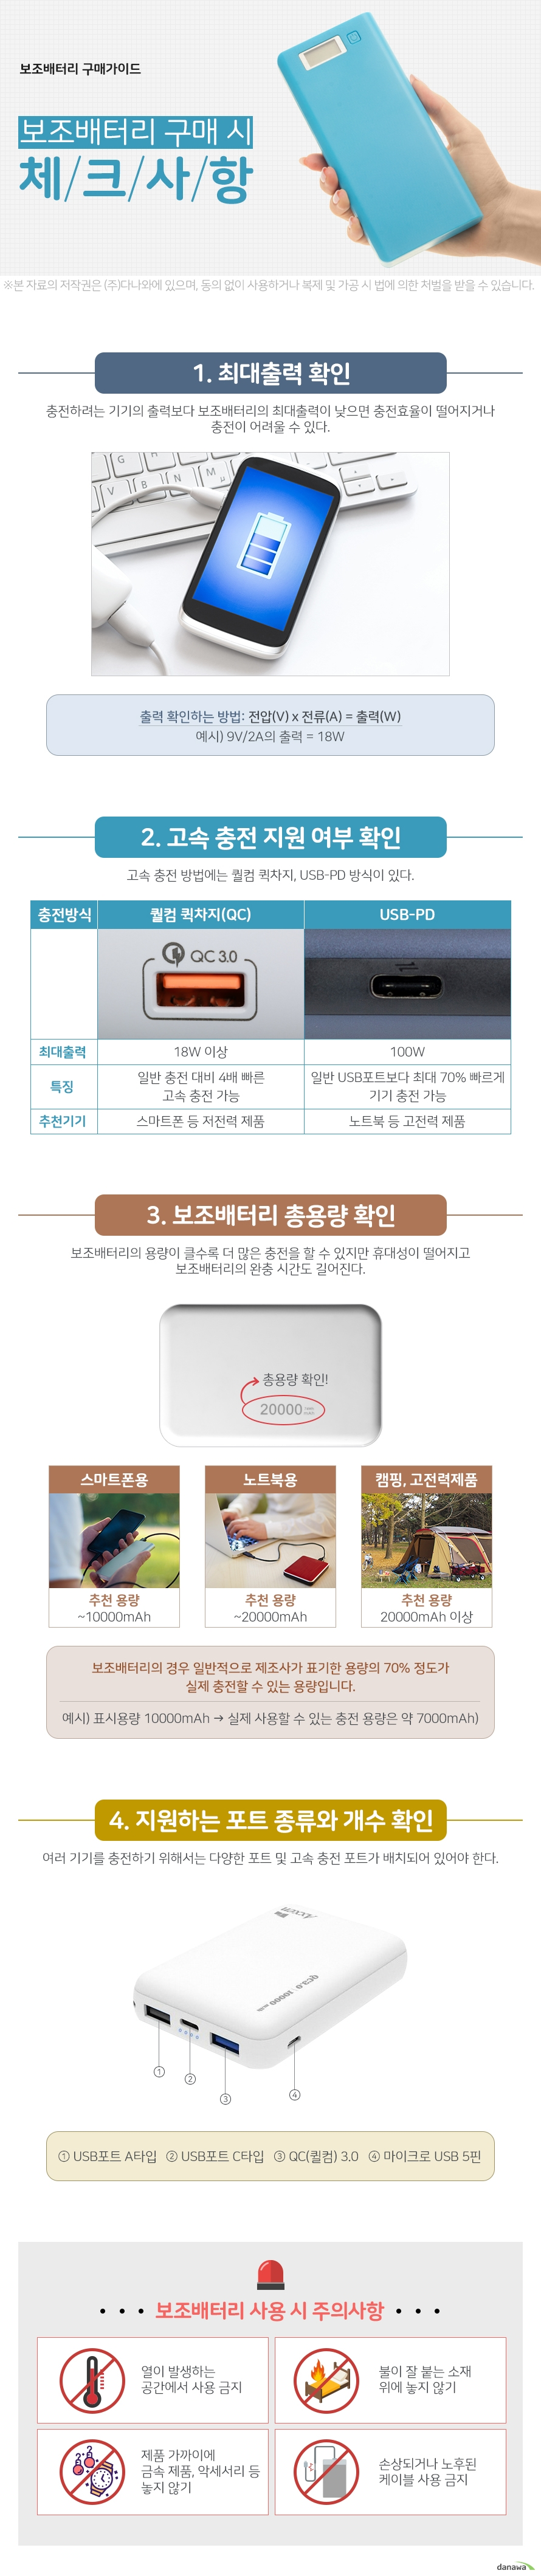 PLEOMAX 2포트 보조배터리 PMPB-10000 10000mAh (정품)